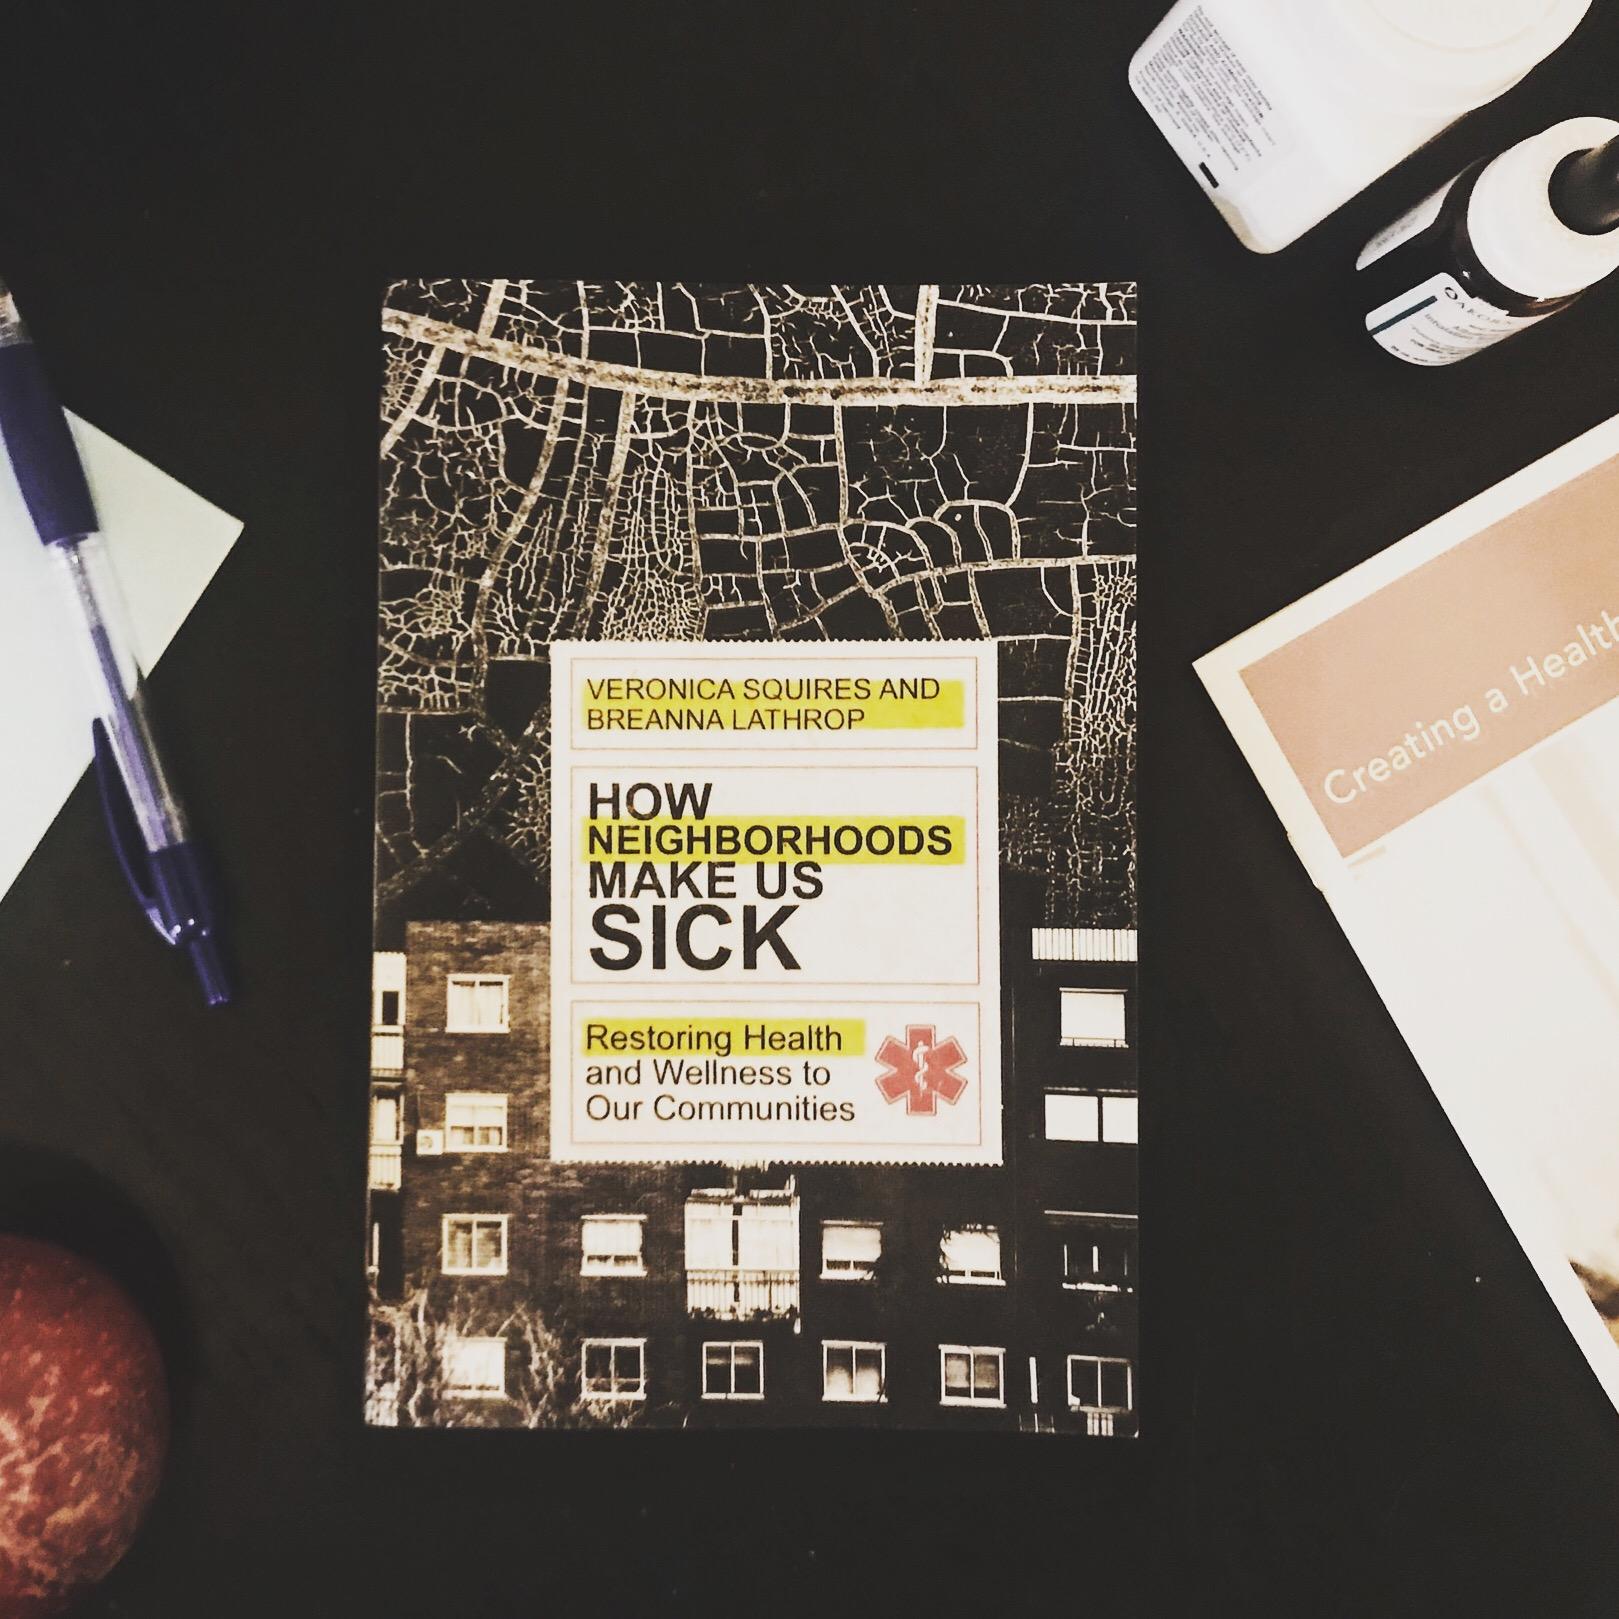 How Neighborhoods Make Us Sick.JPG